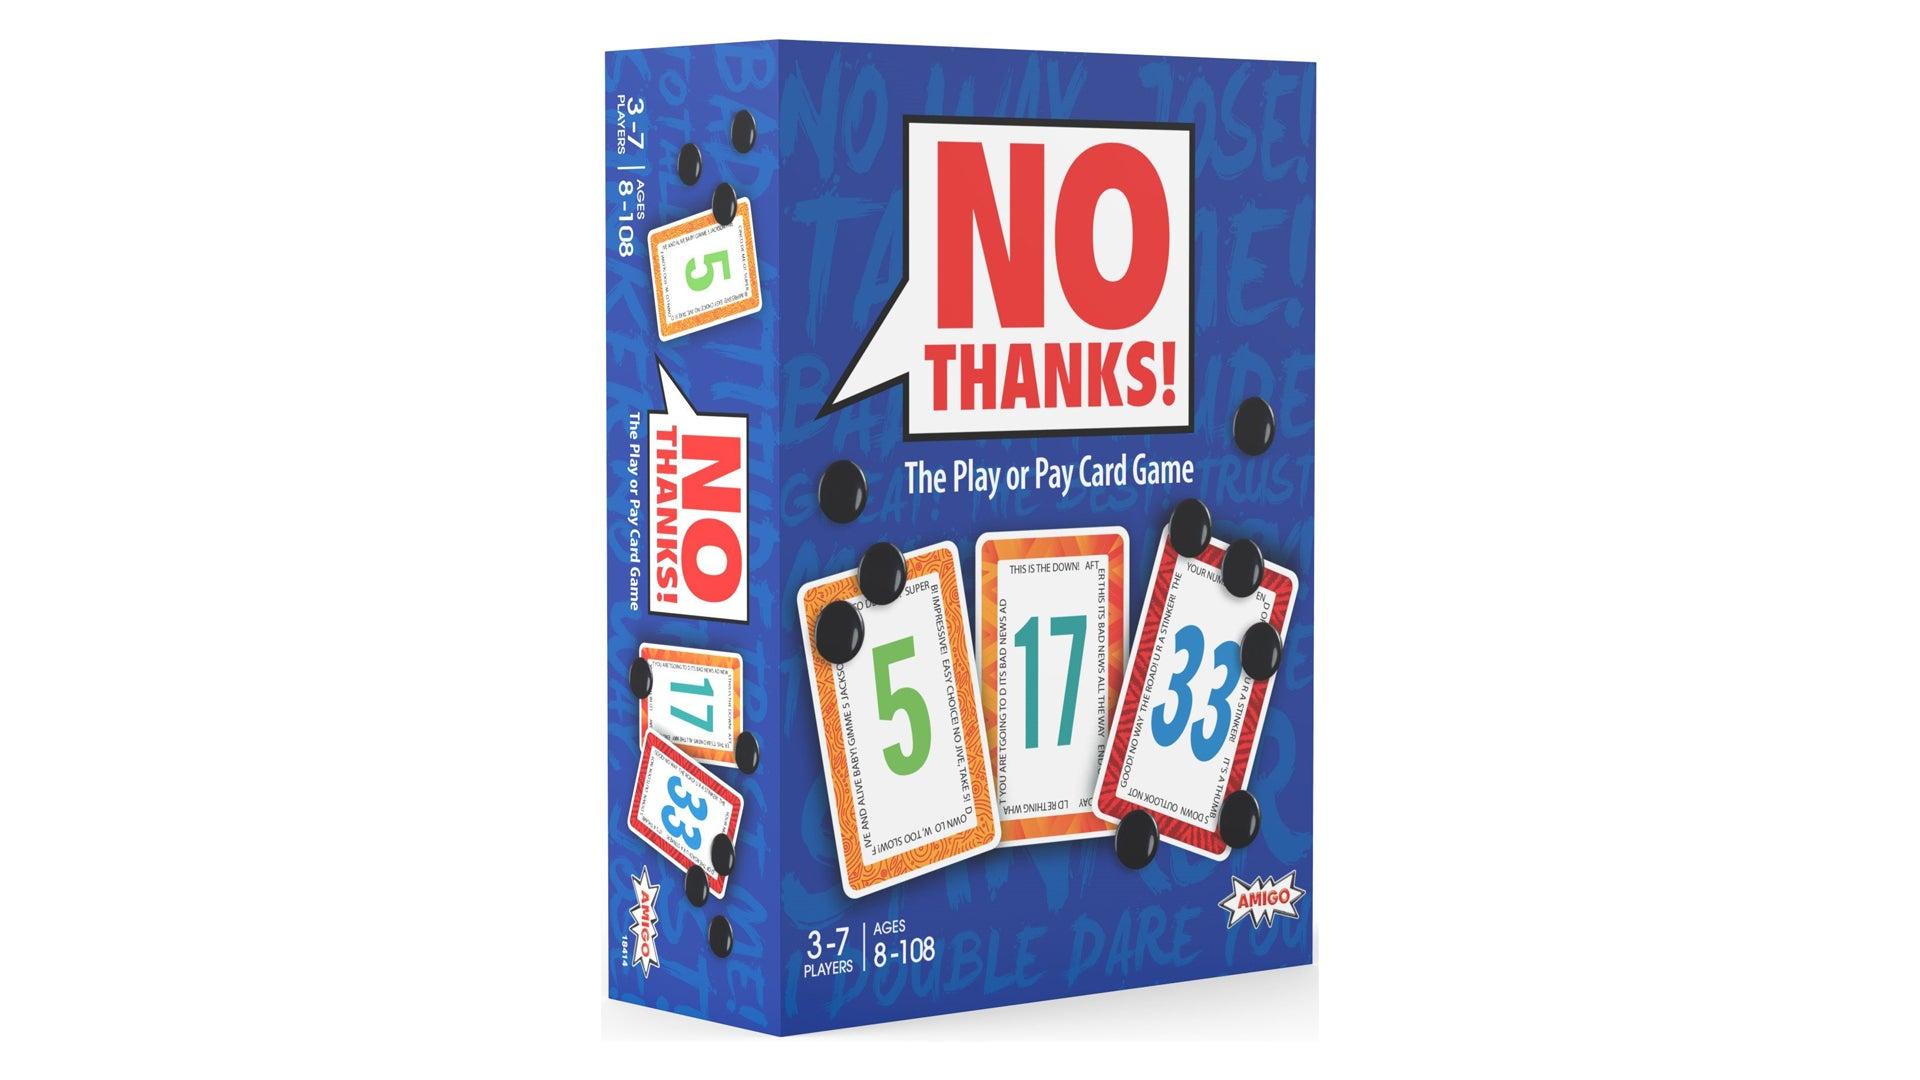 No Thanks! beginner board game box